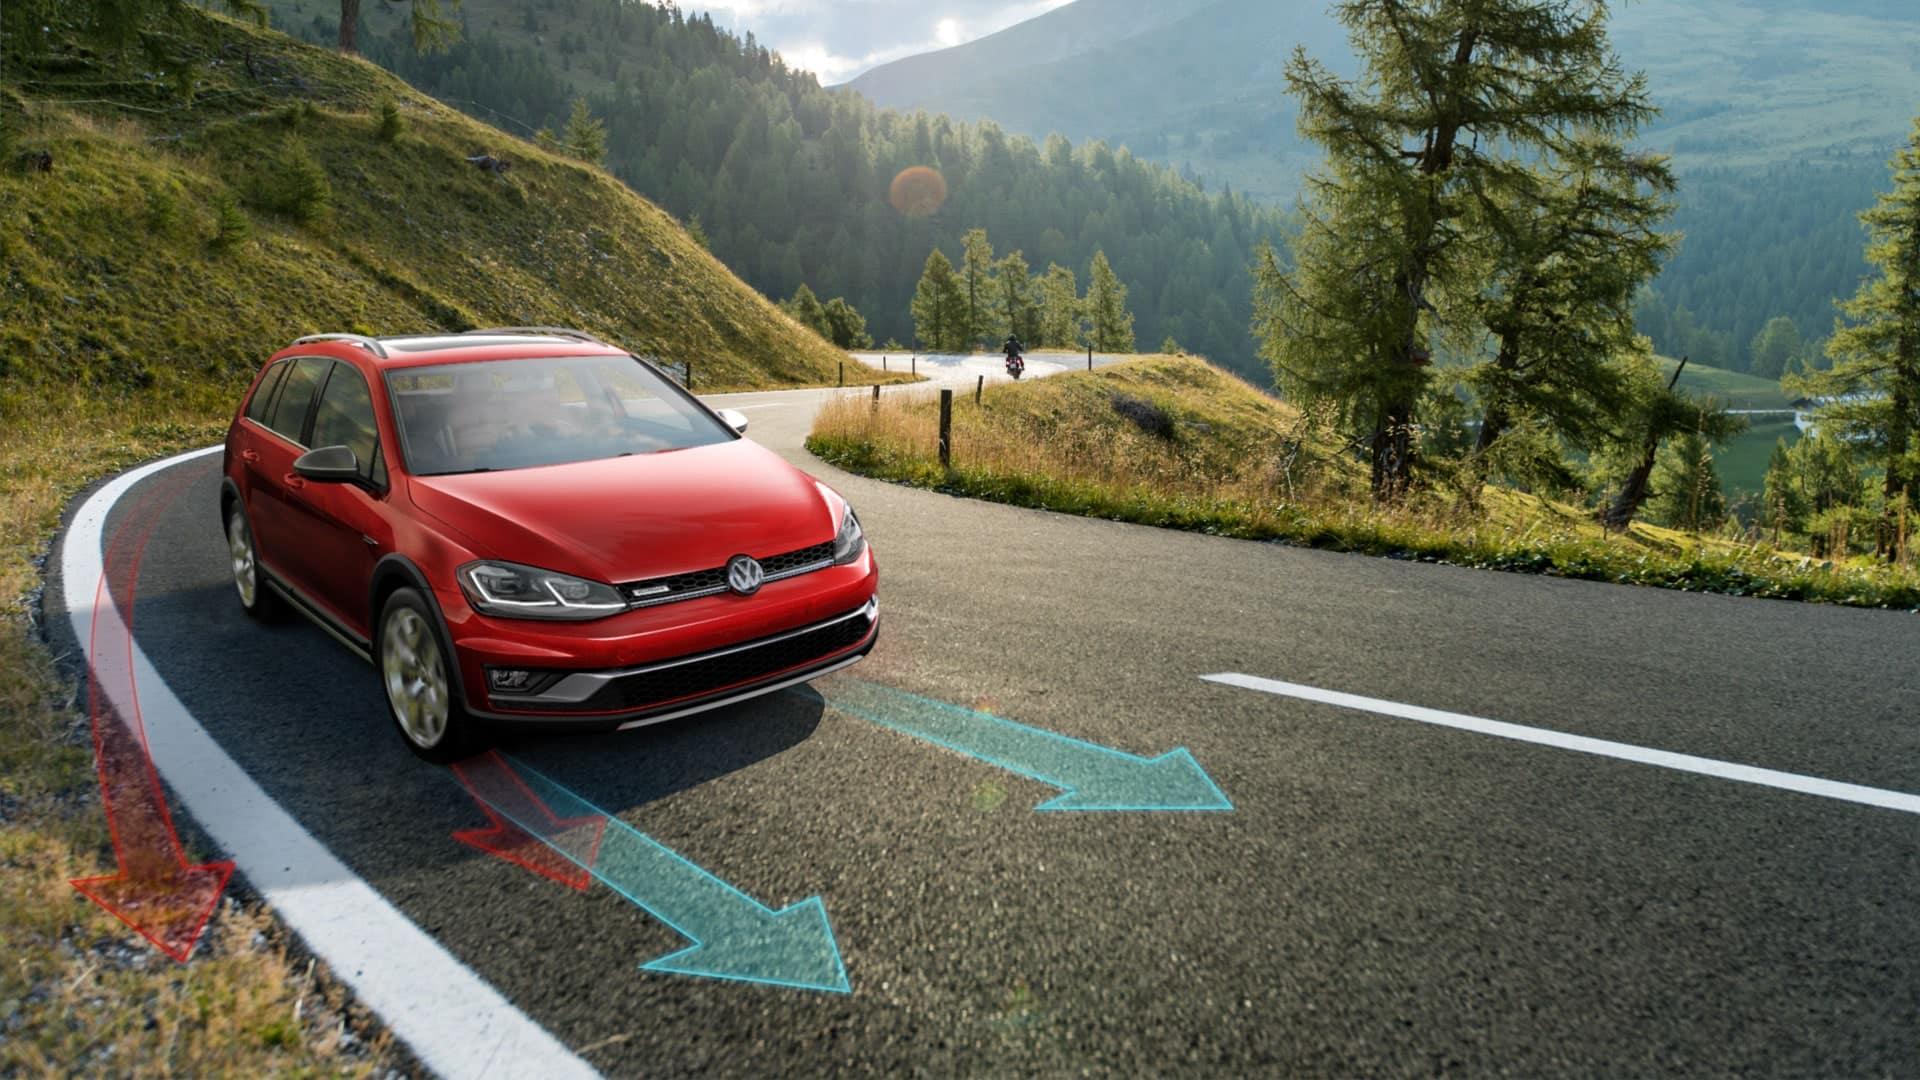 2019 VW Gofl Alltrack cornering with ease